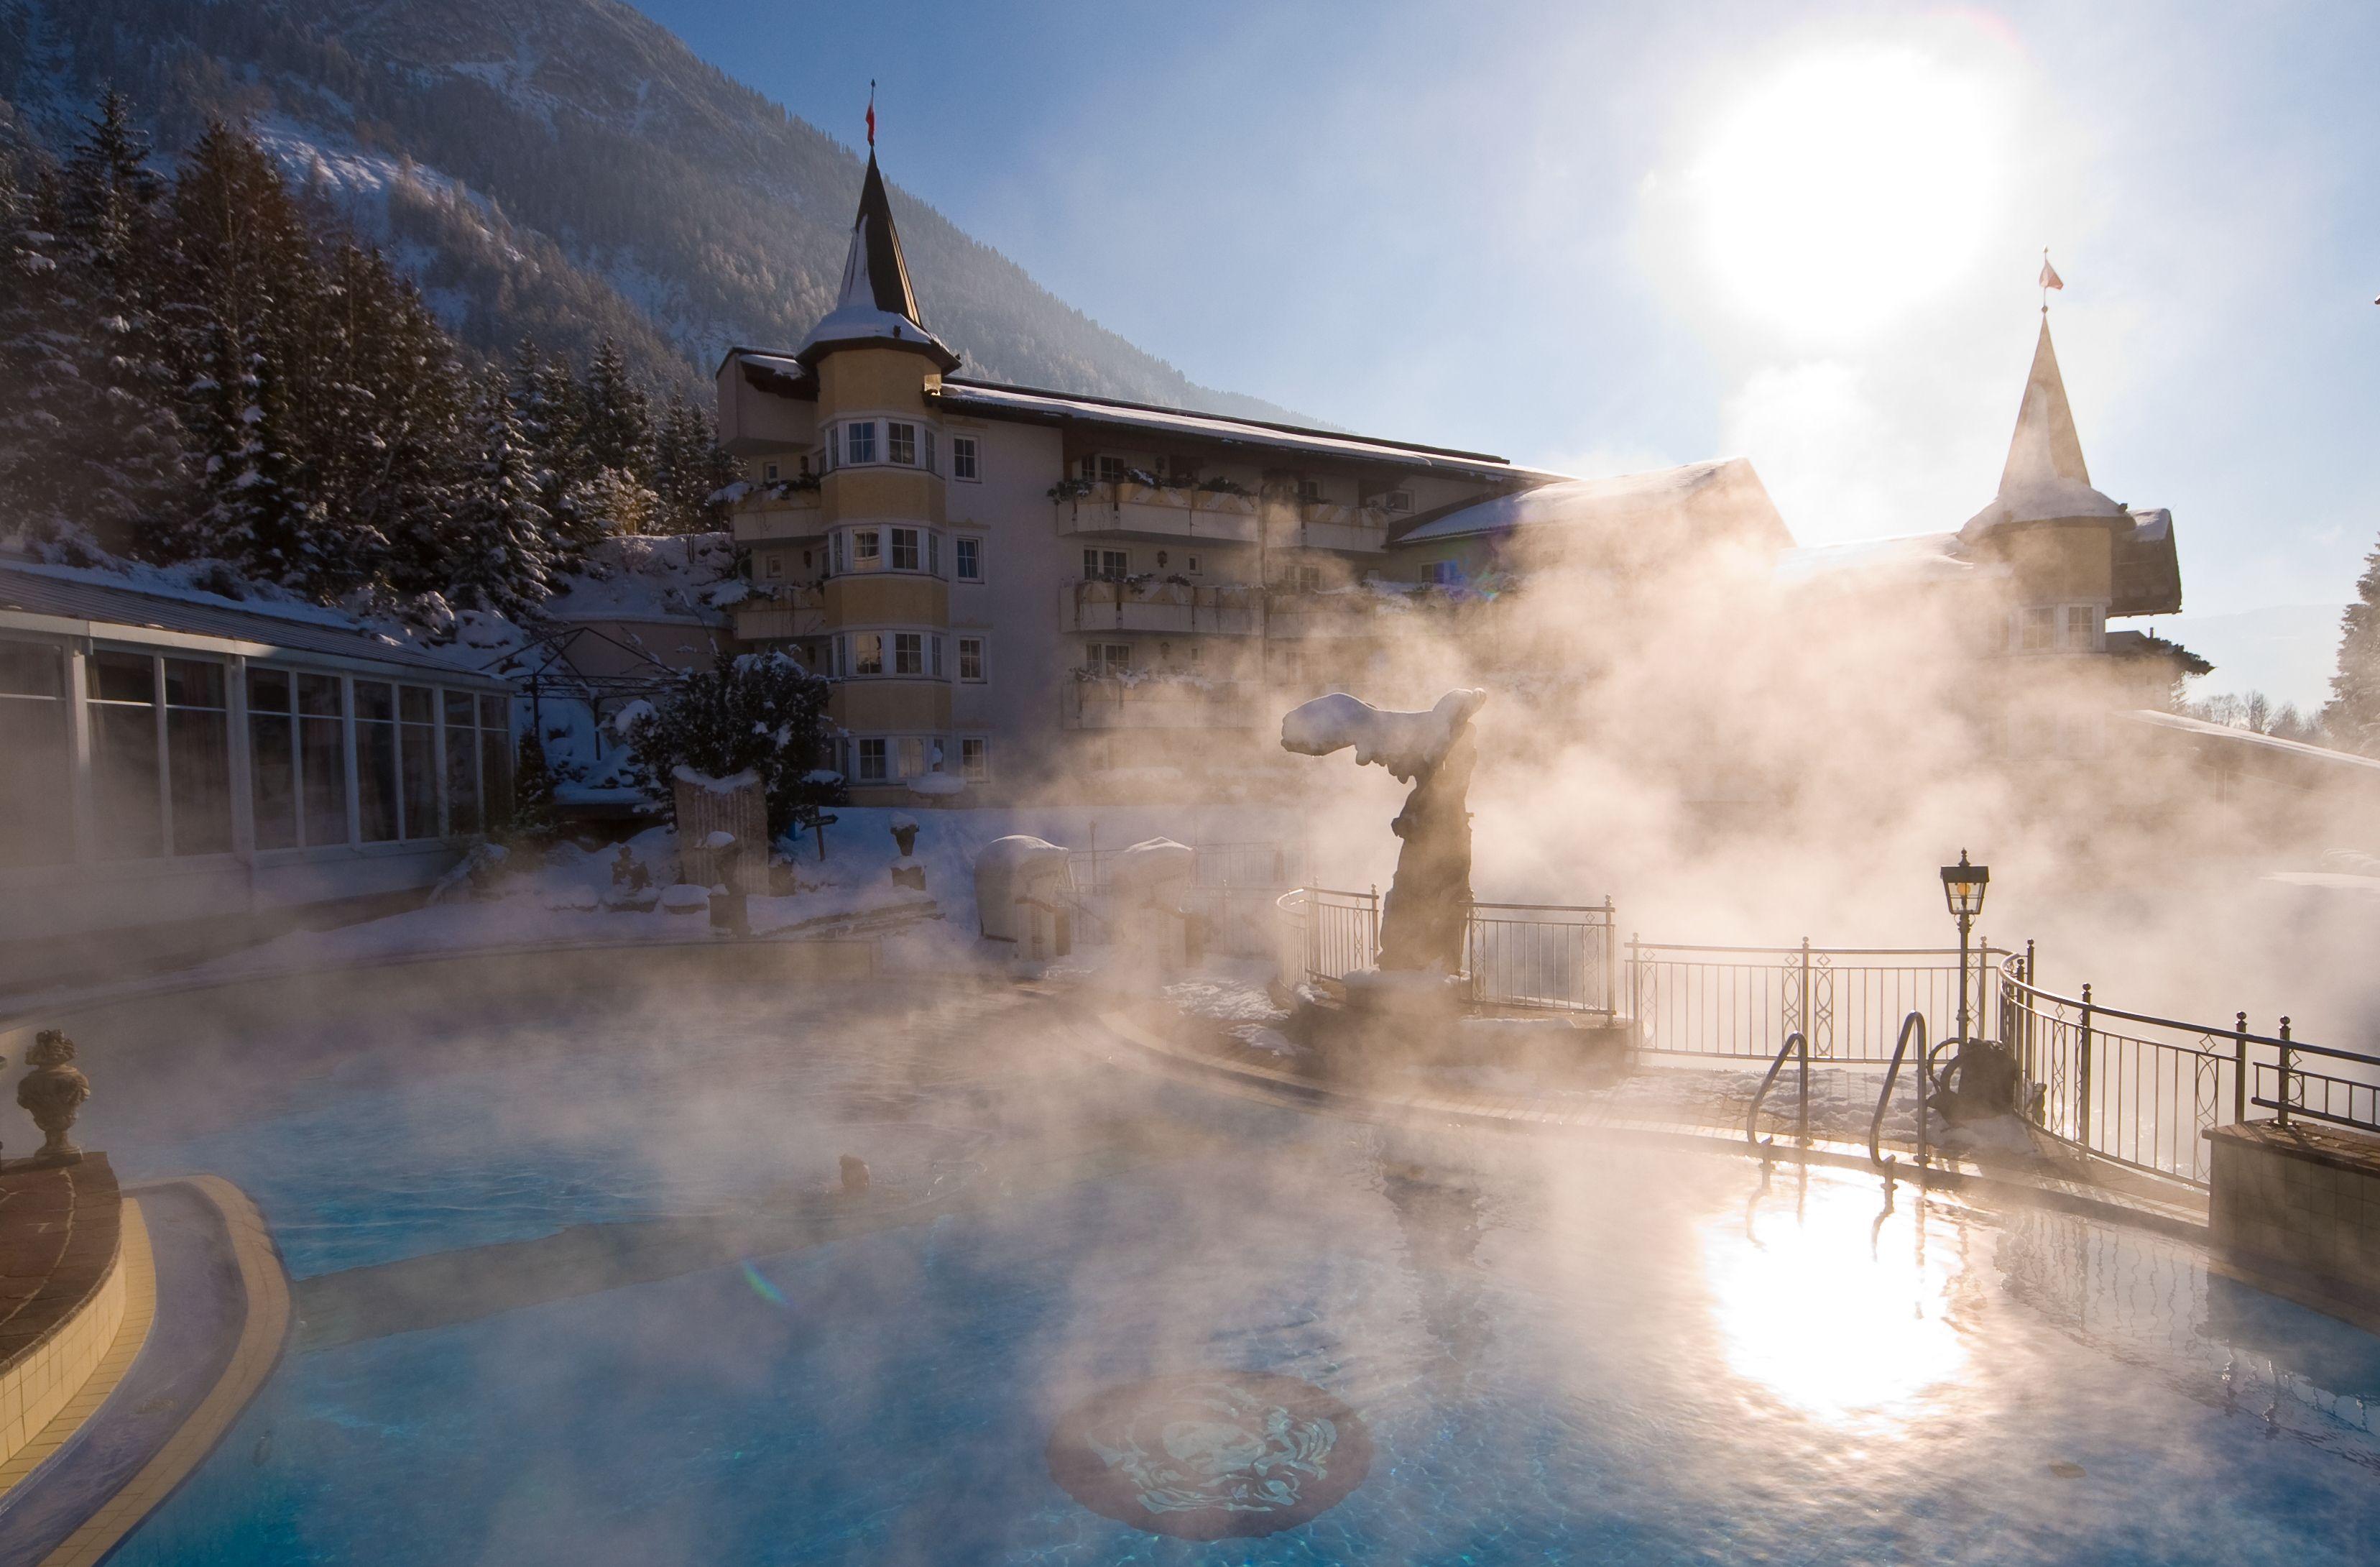 Außenpool, Winter, Schnee, Sonne   Spa-Oasen   Post hotel ...